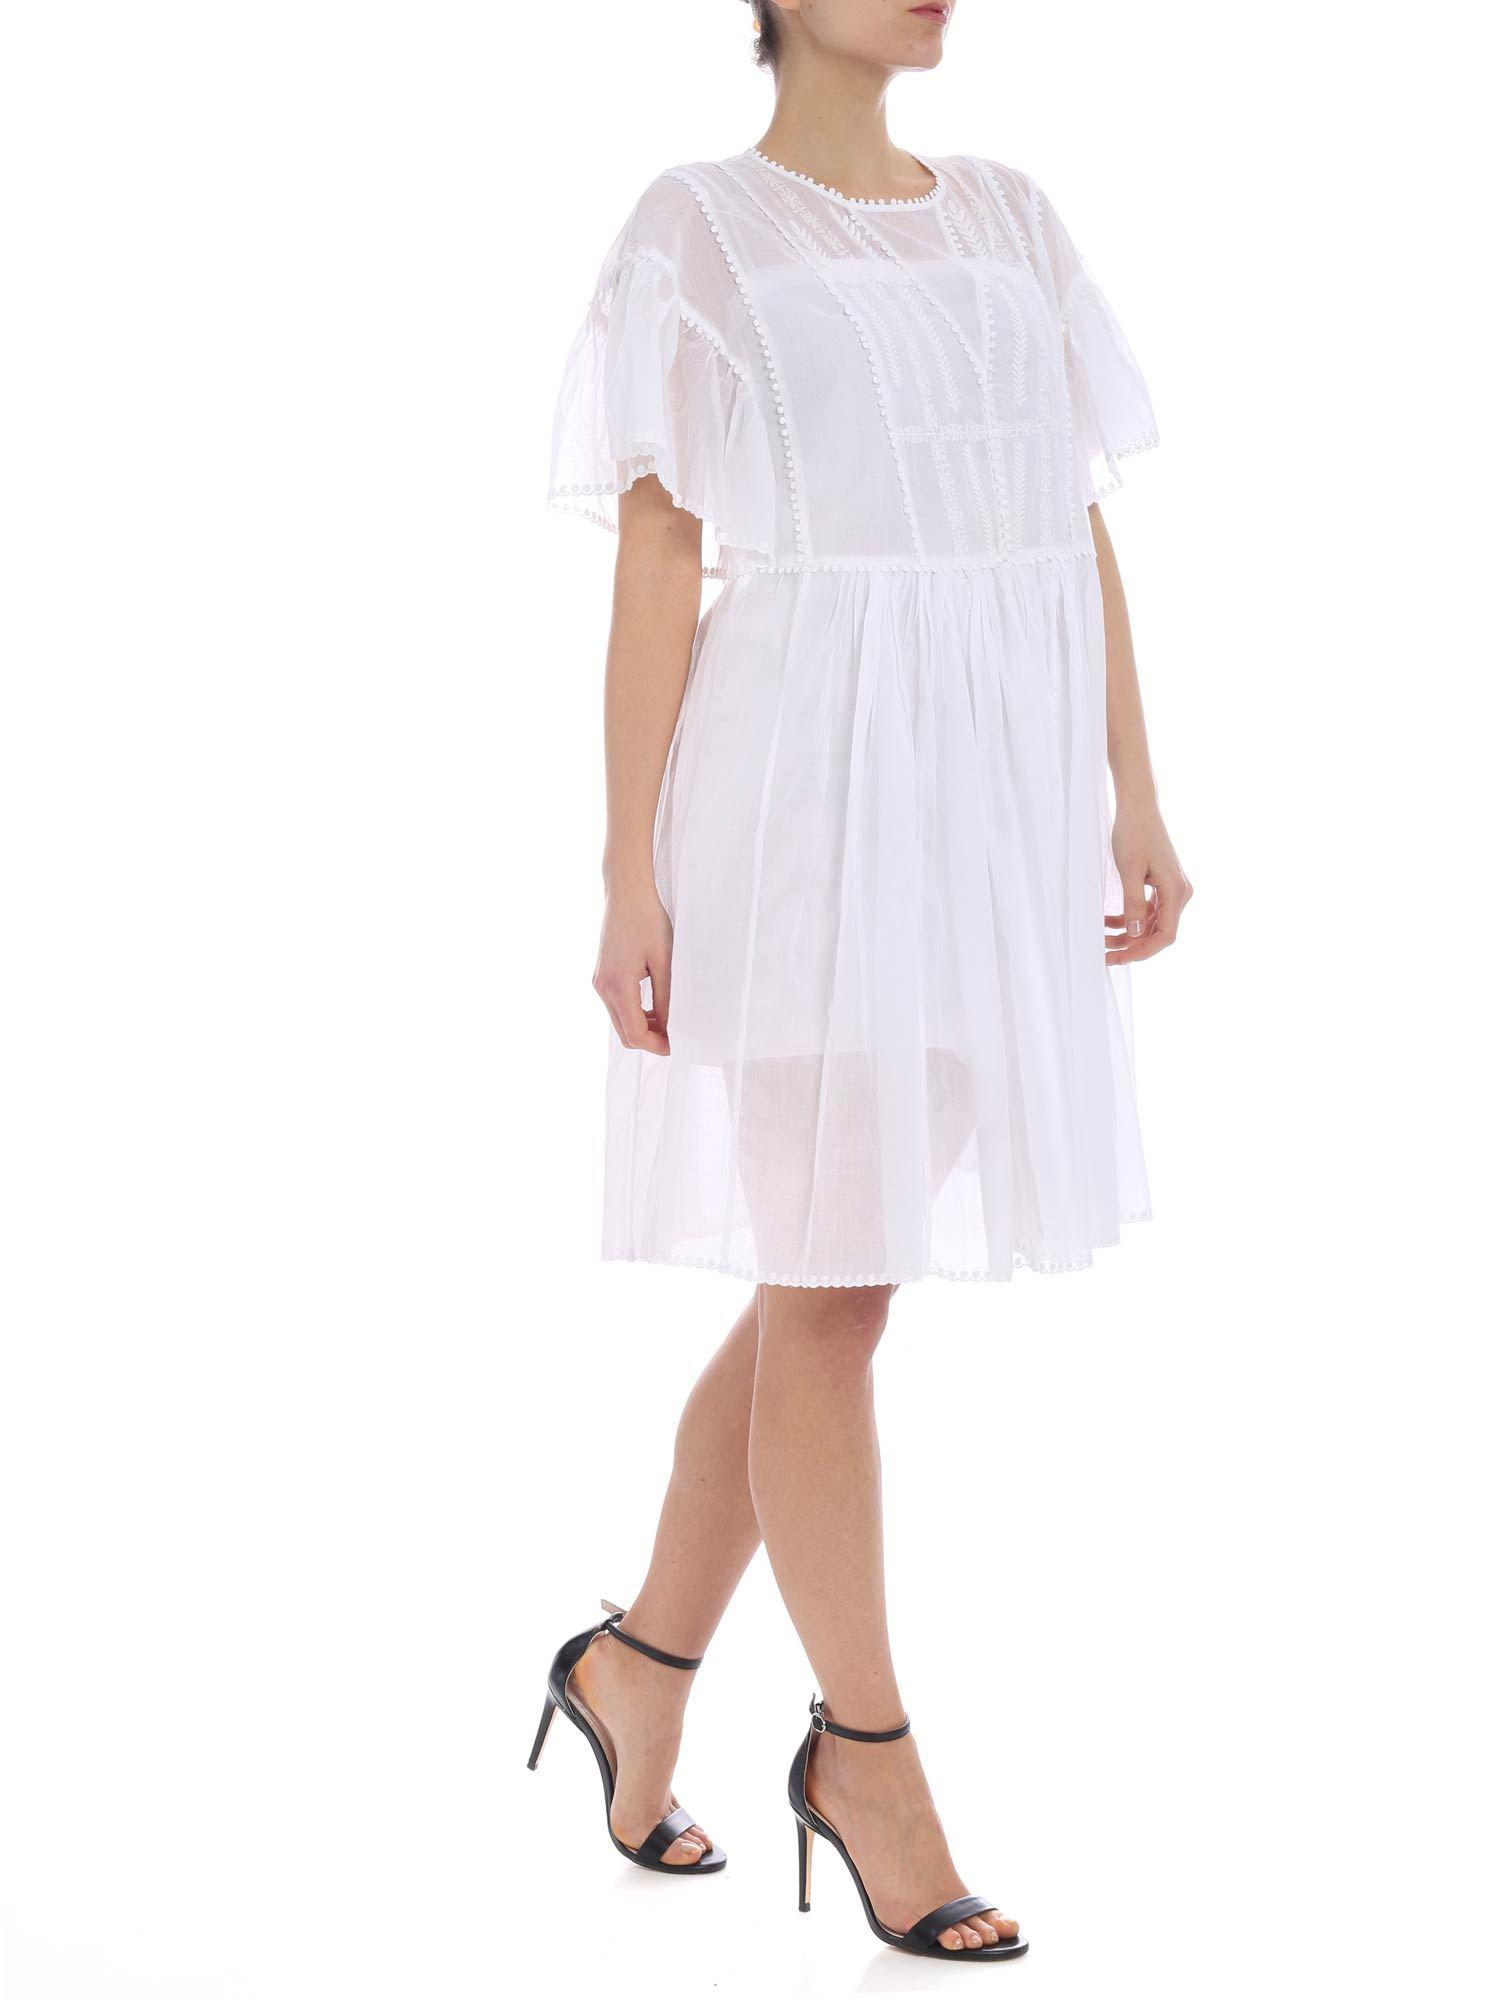 a7d9b1c34c1 Étoile Isabel Marant - White Annaelle Dress - Lyst. View fullscreen